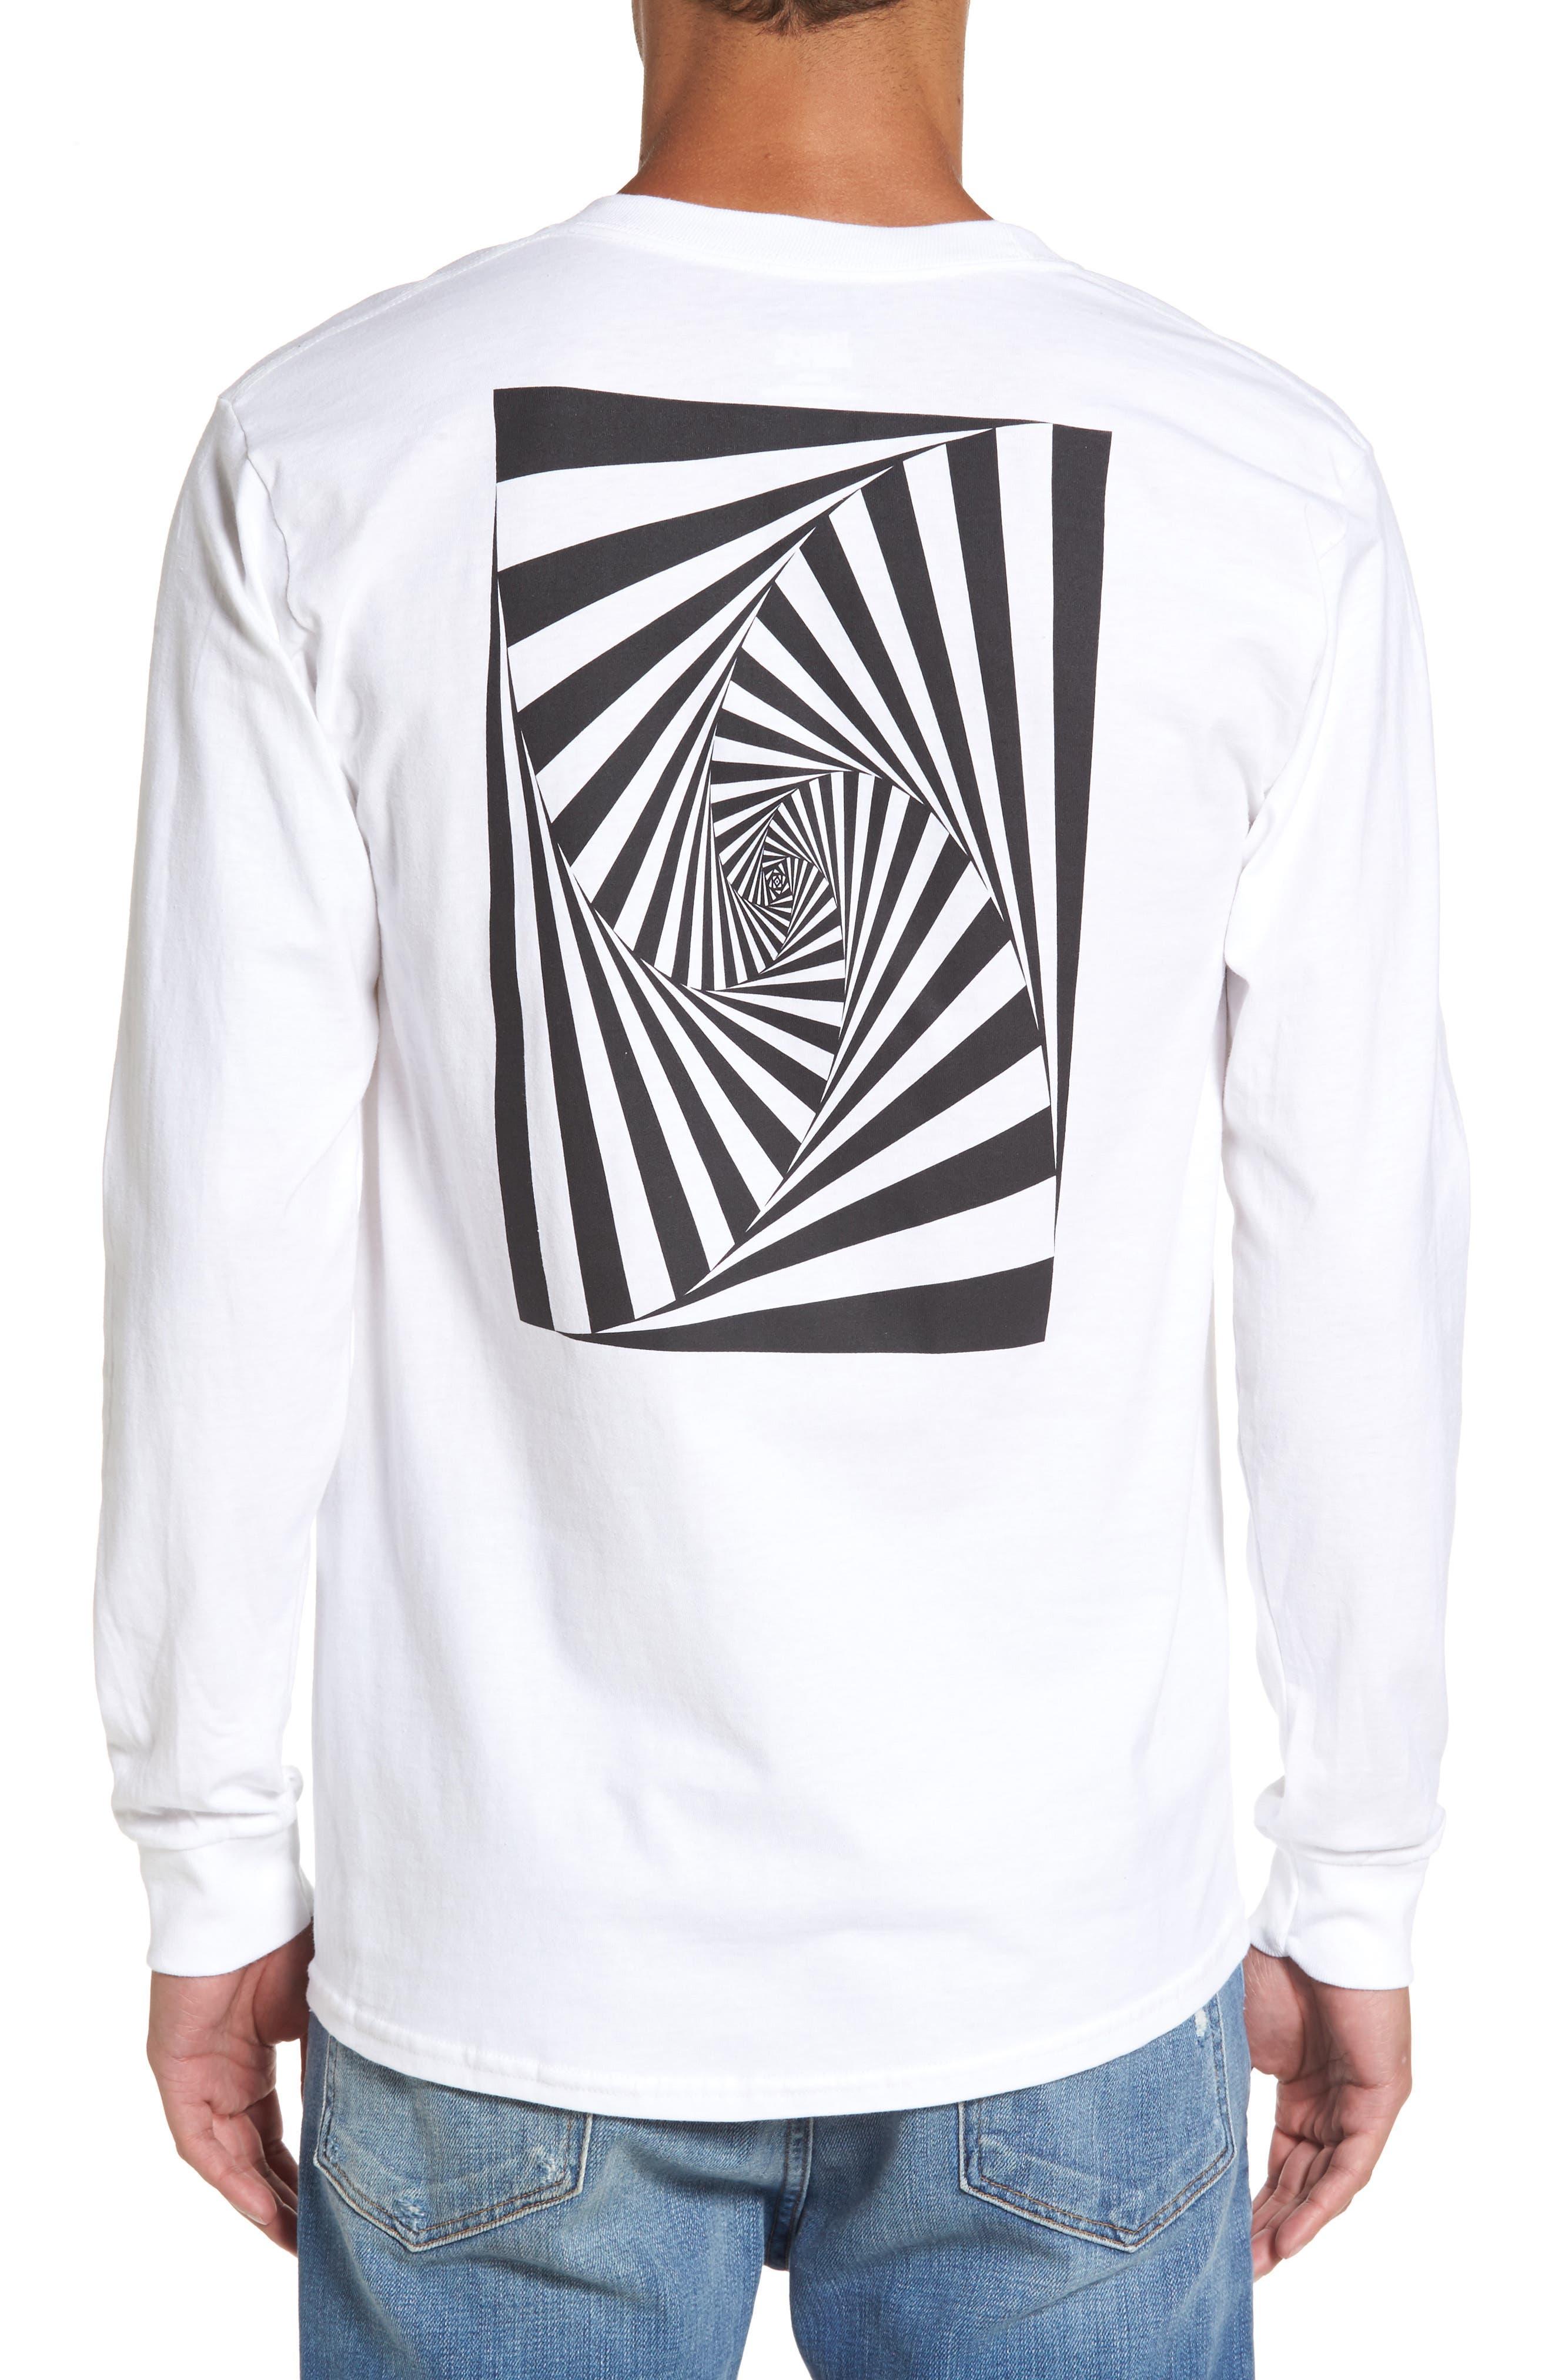 Vision Street Wear Long Sleeve T-Shirt,                             Alternate thumbnail 3, color,                             100